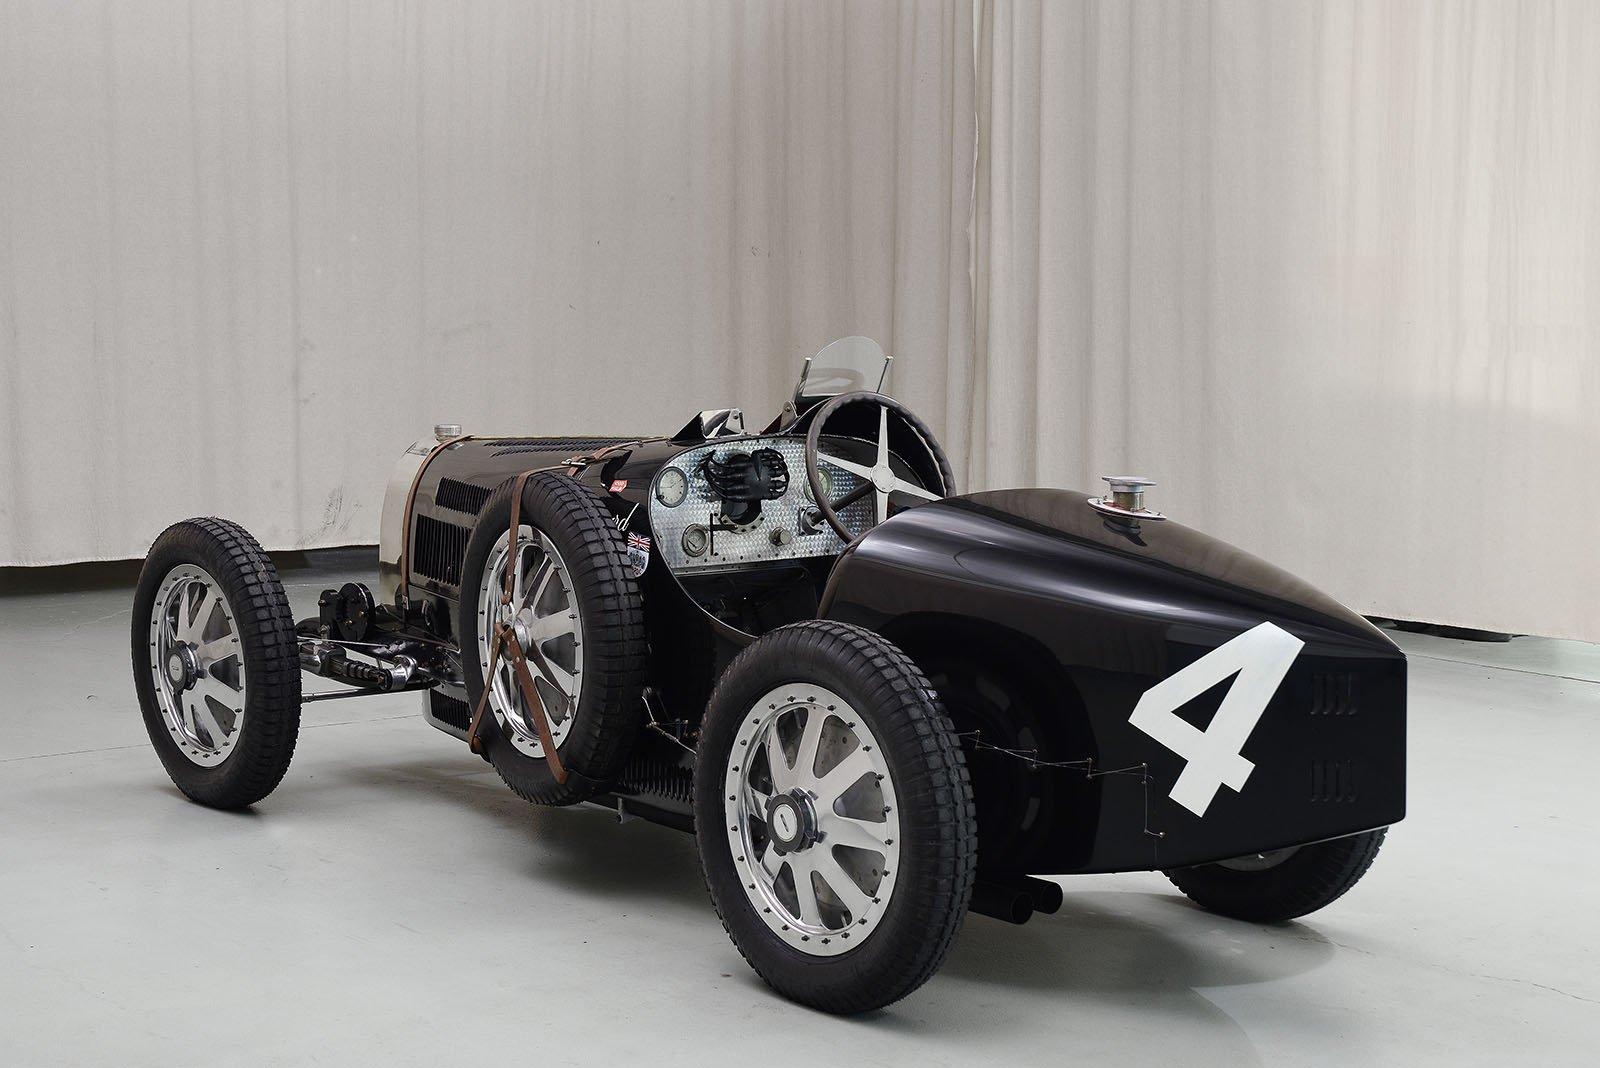 Bugattis For Sale >> 1925 Bugatti Type 35B Replica | Hyman Ltd. Classic Cars